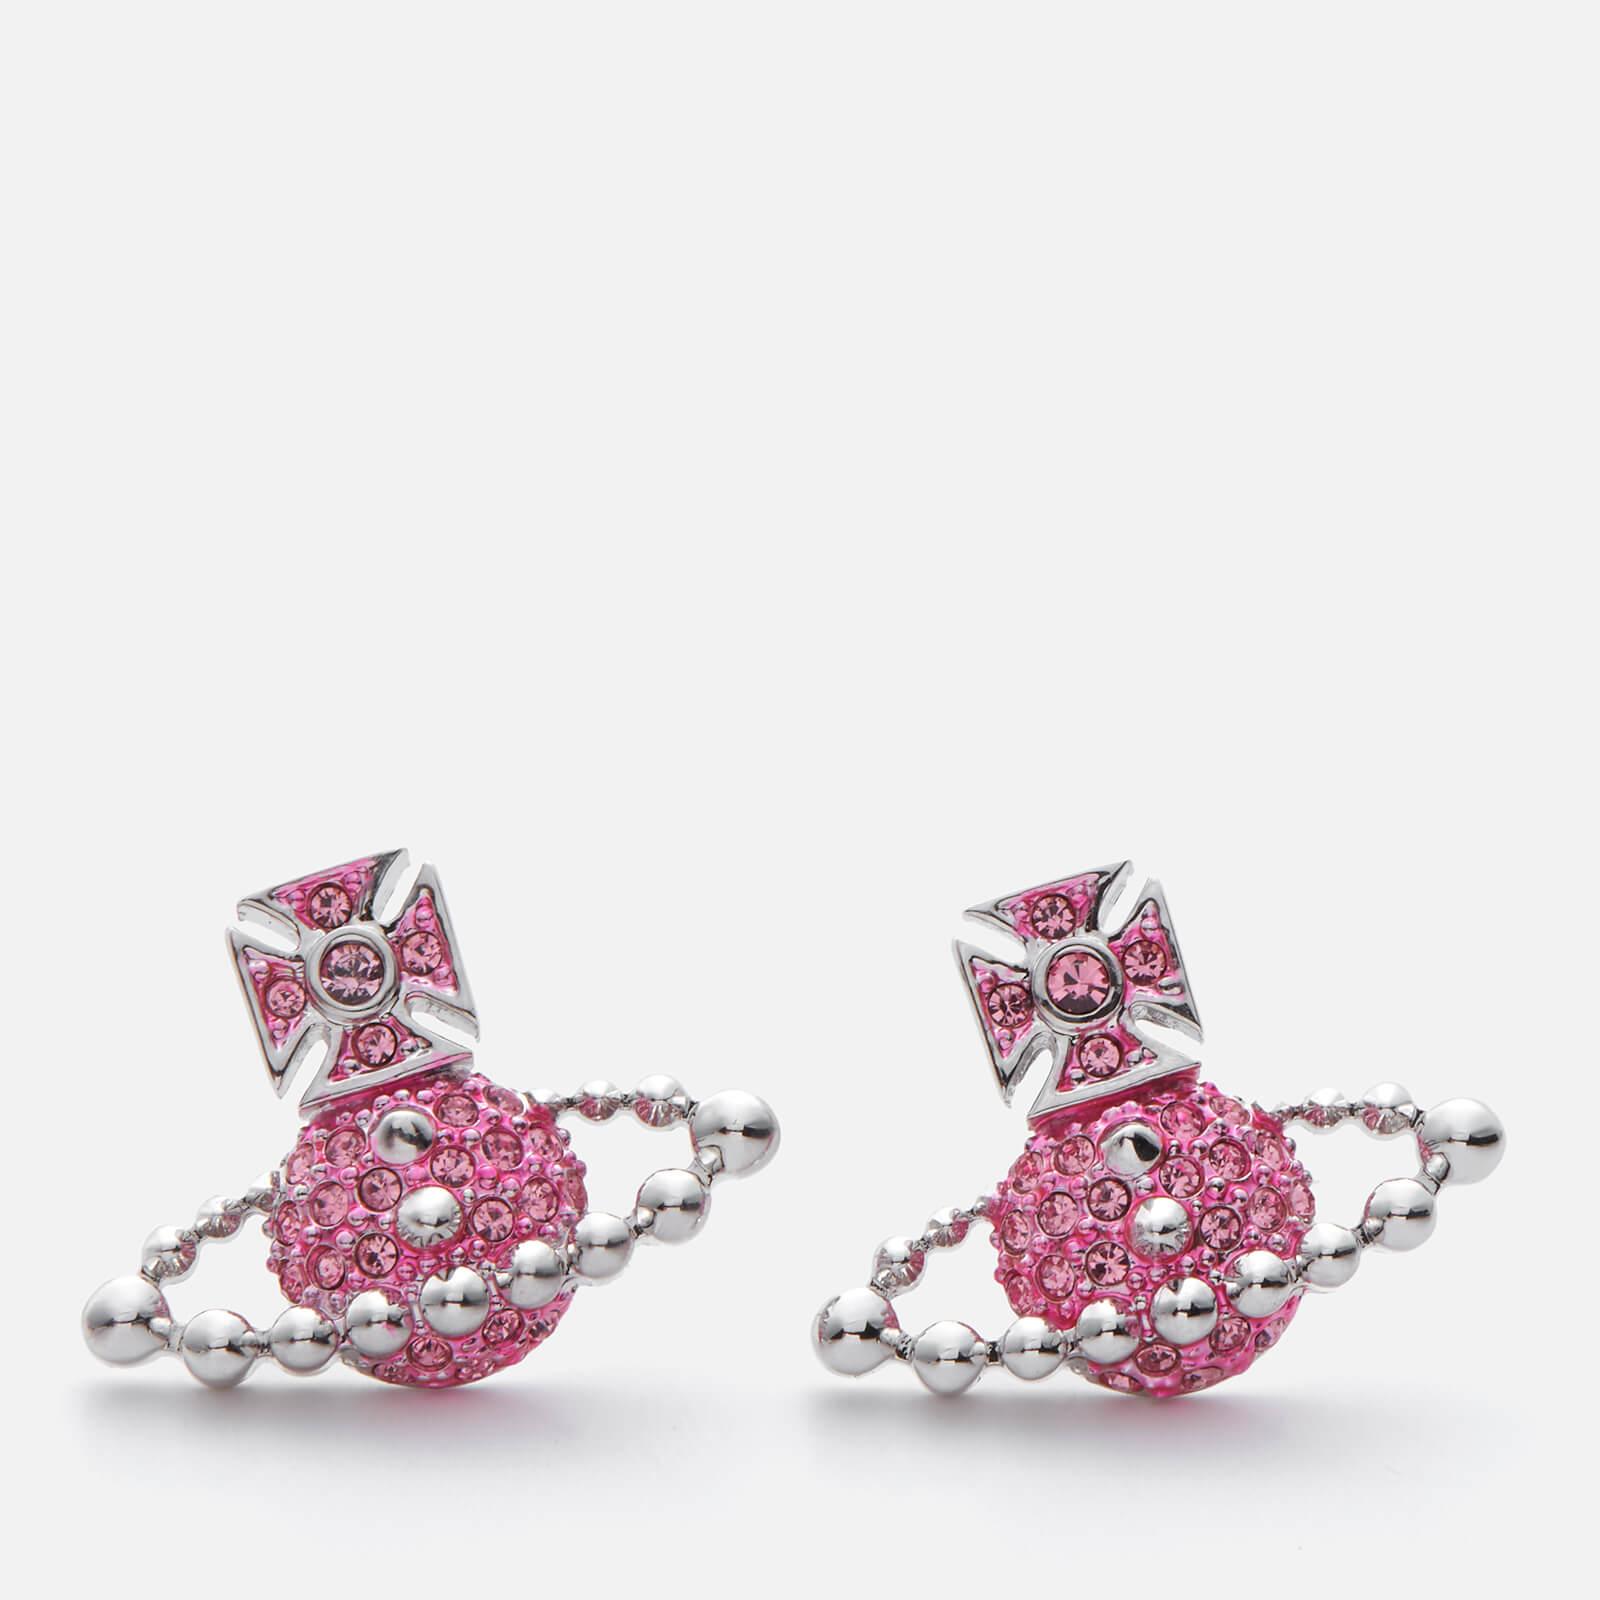 065f35cb00e0bd Vivienne Westwood Women's Lena Bas Relief Earrings - Light Rose ...